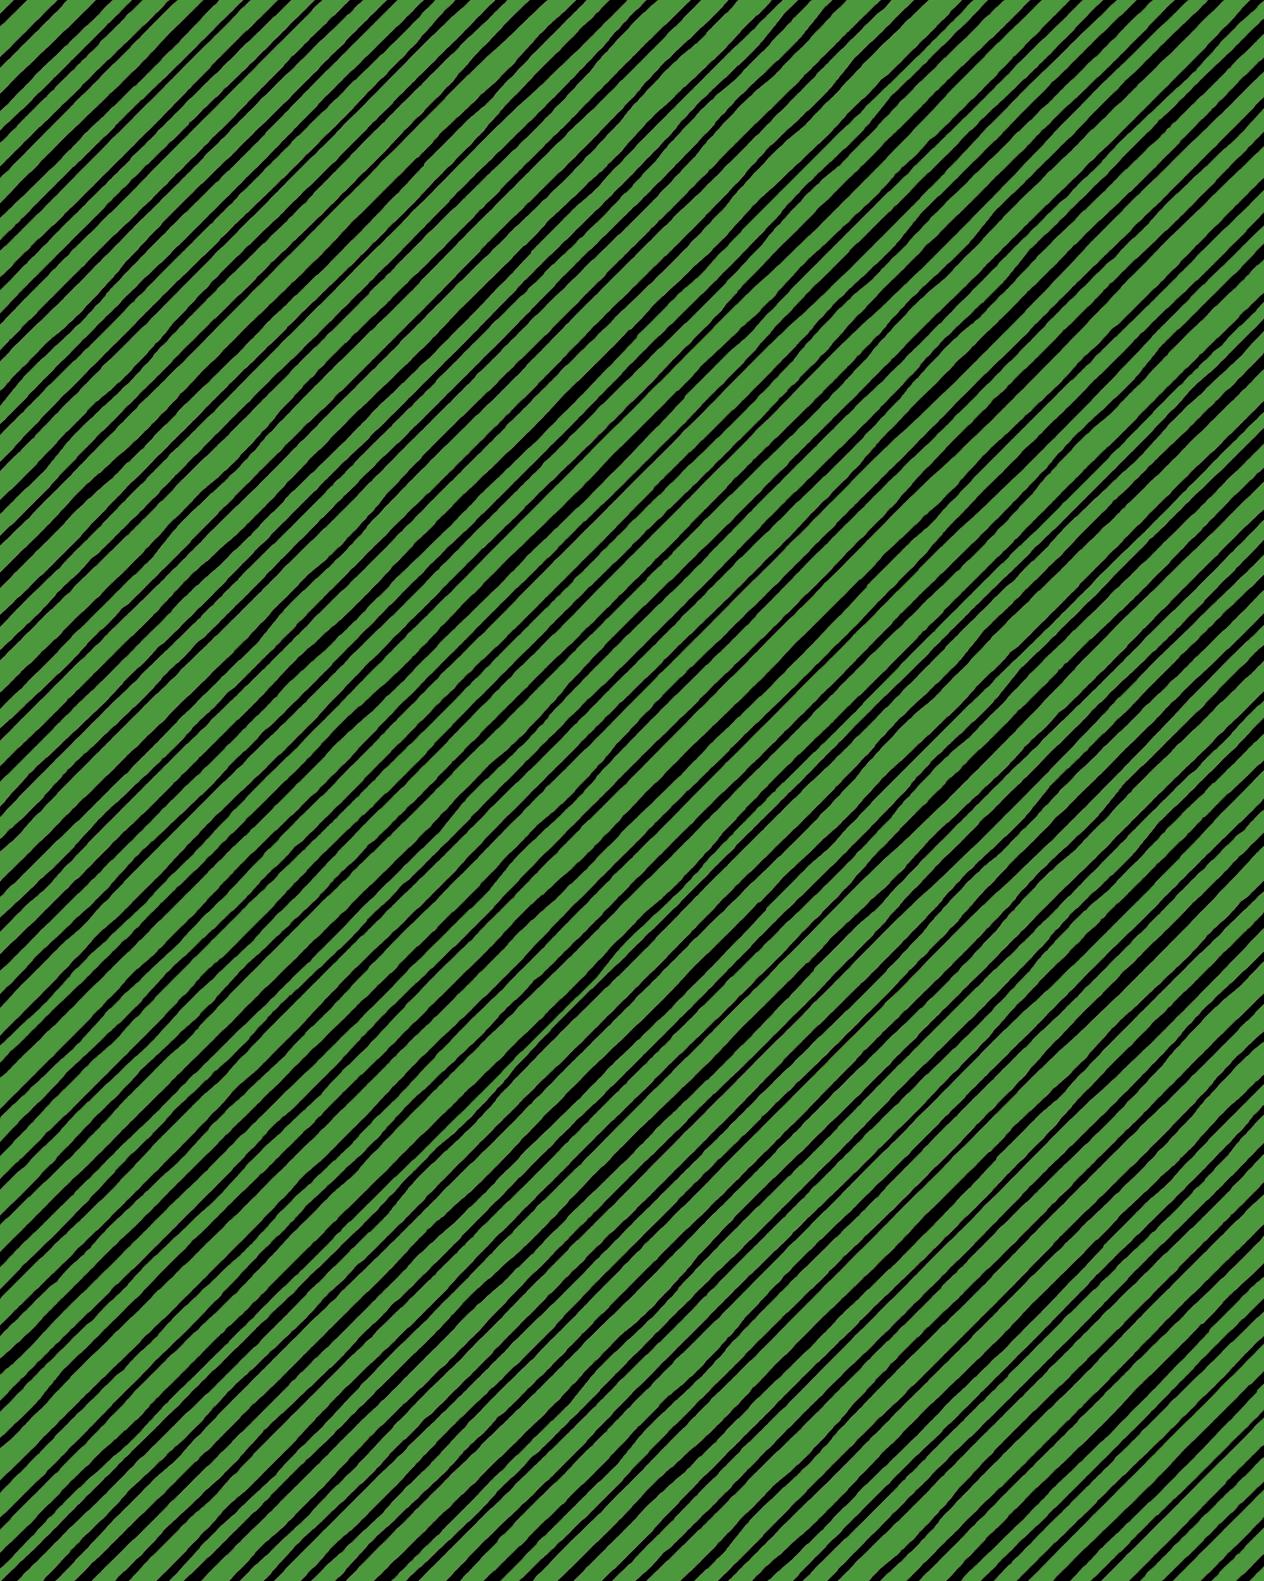 【Loralie Designs】- QUIRKYBIAS STRIPE GREEN -(ULH-317)